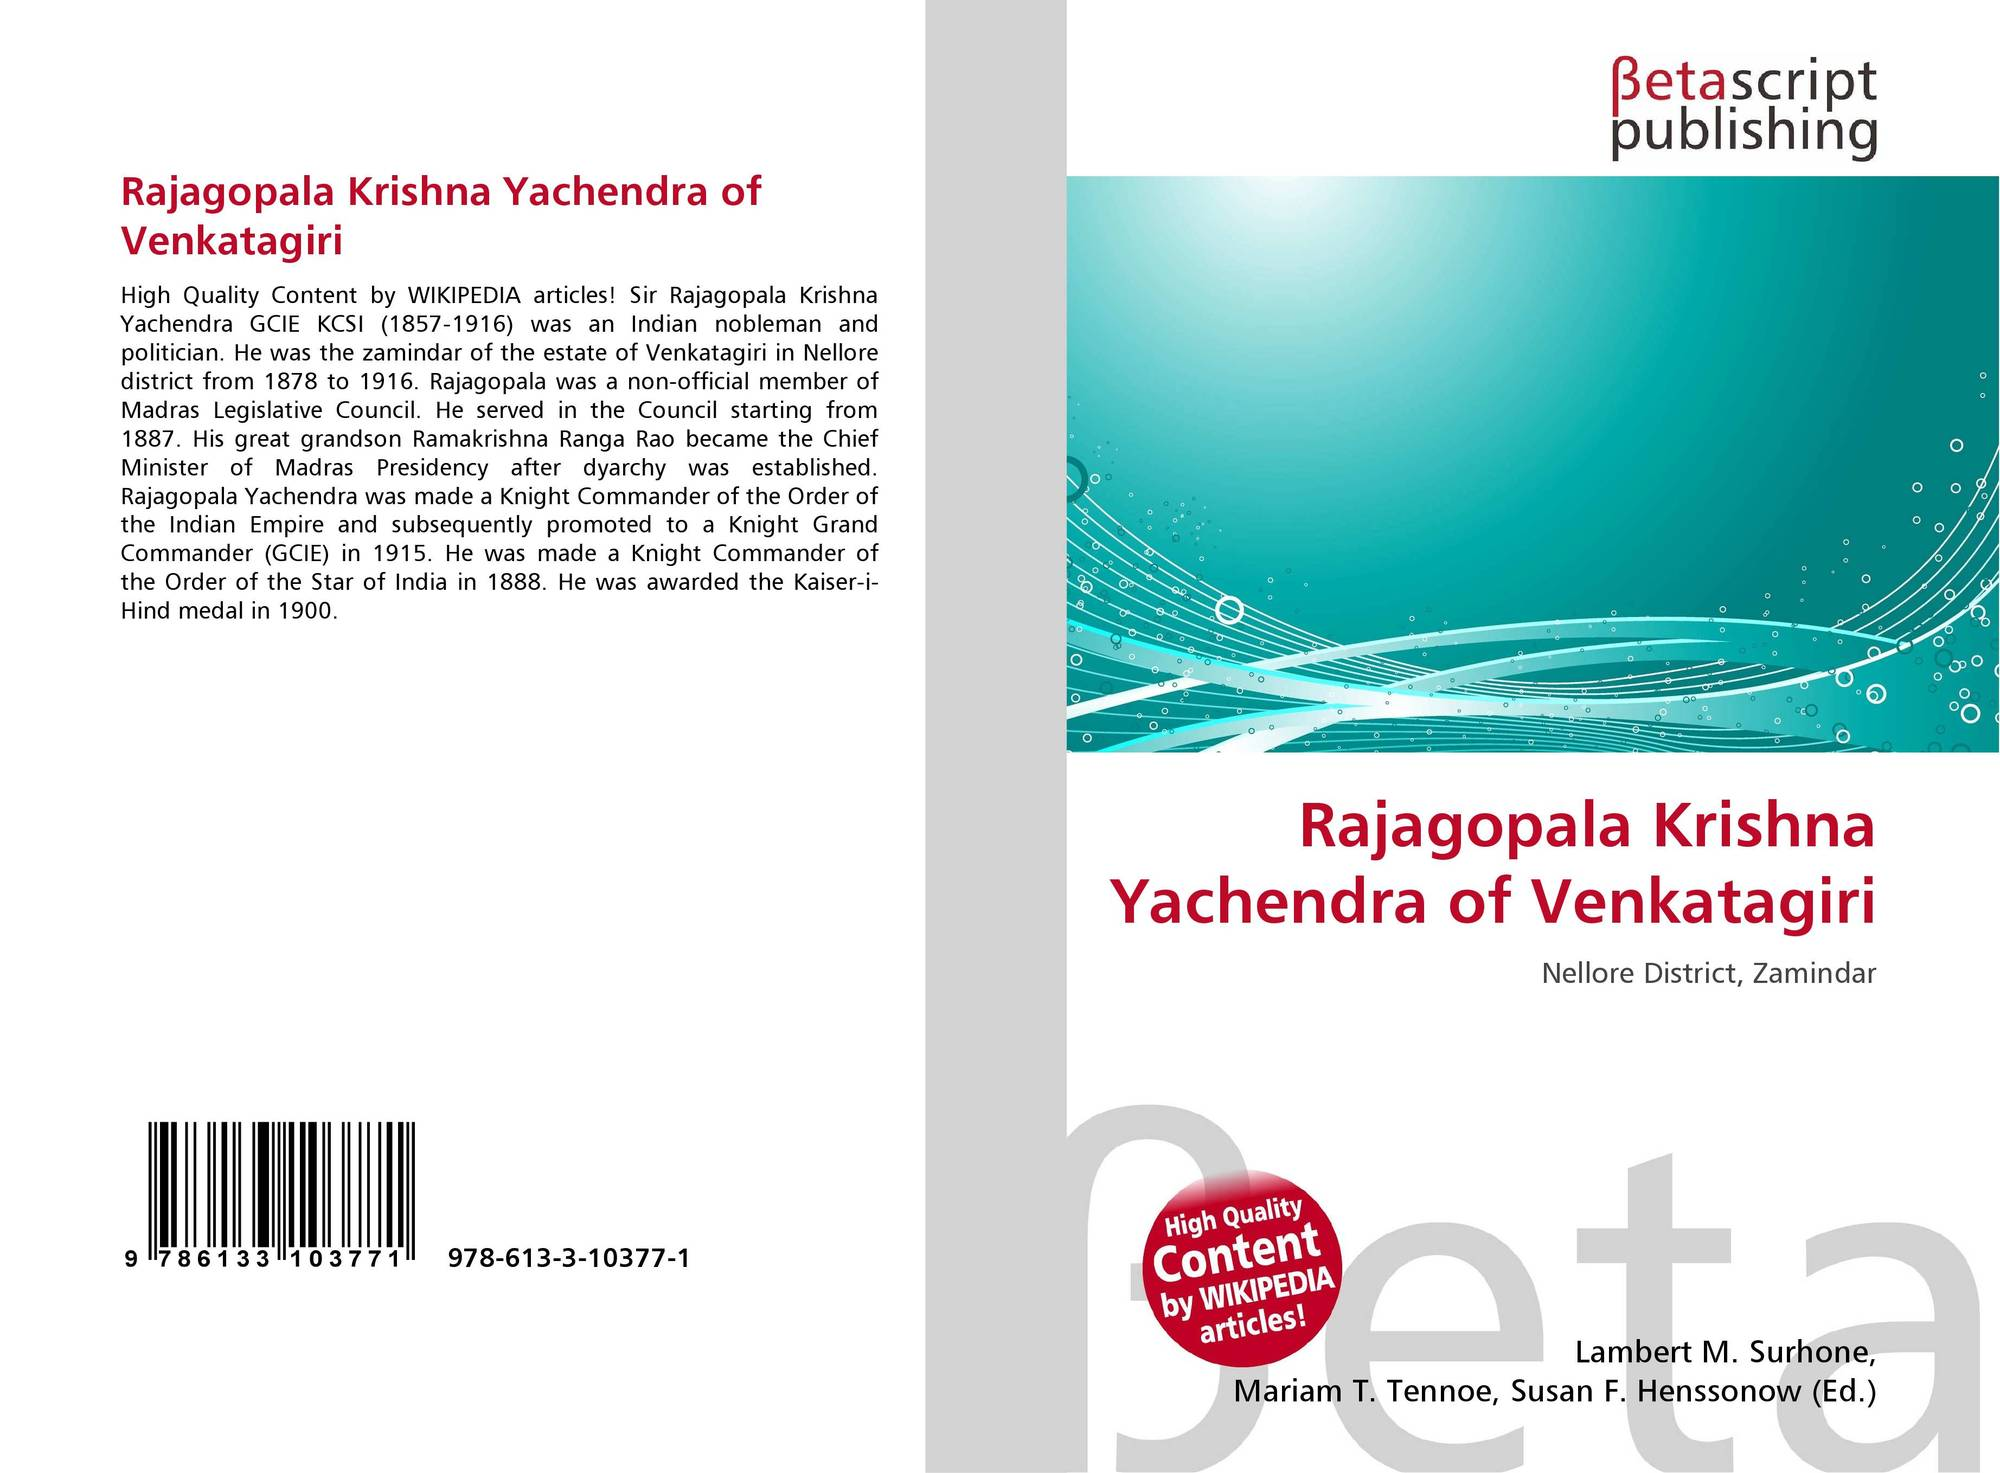 Rajagopala Krishna Yachendra